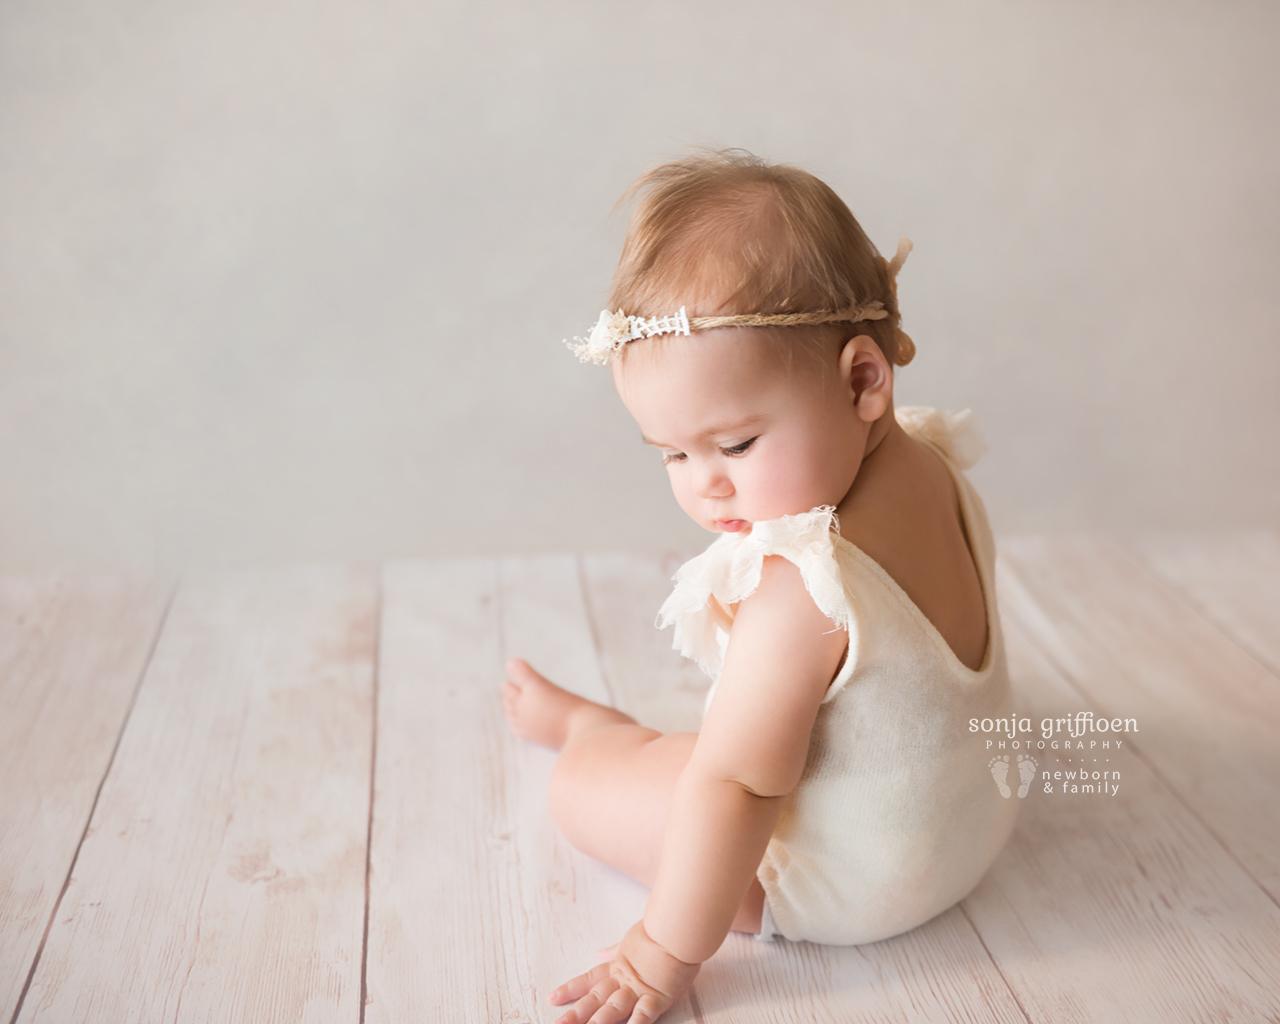 Thalia-Milestone-Brisbane-Newborn-Photographer-Sonja-Griffioen-07.jpg